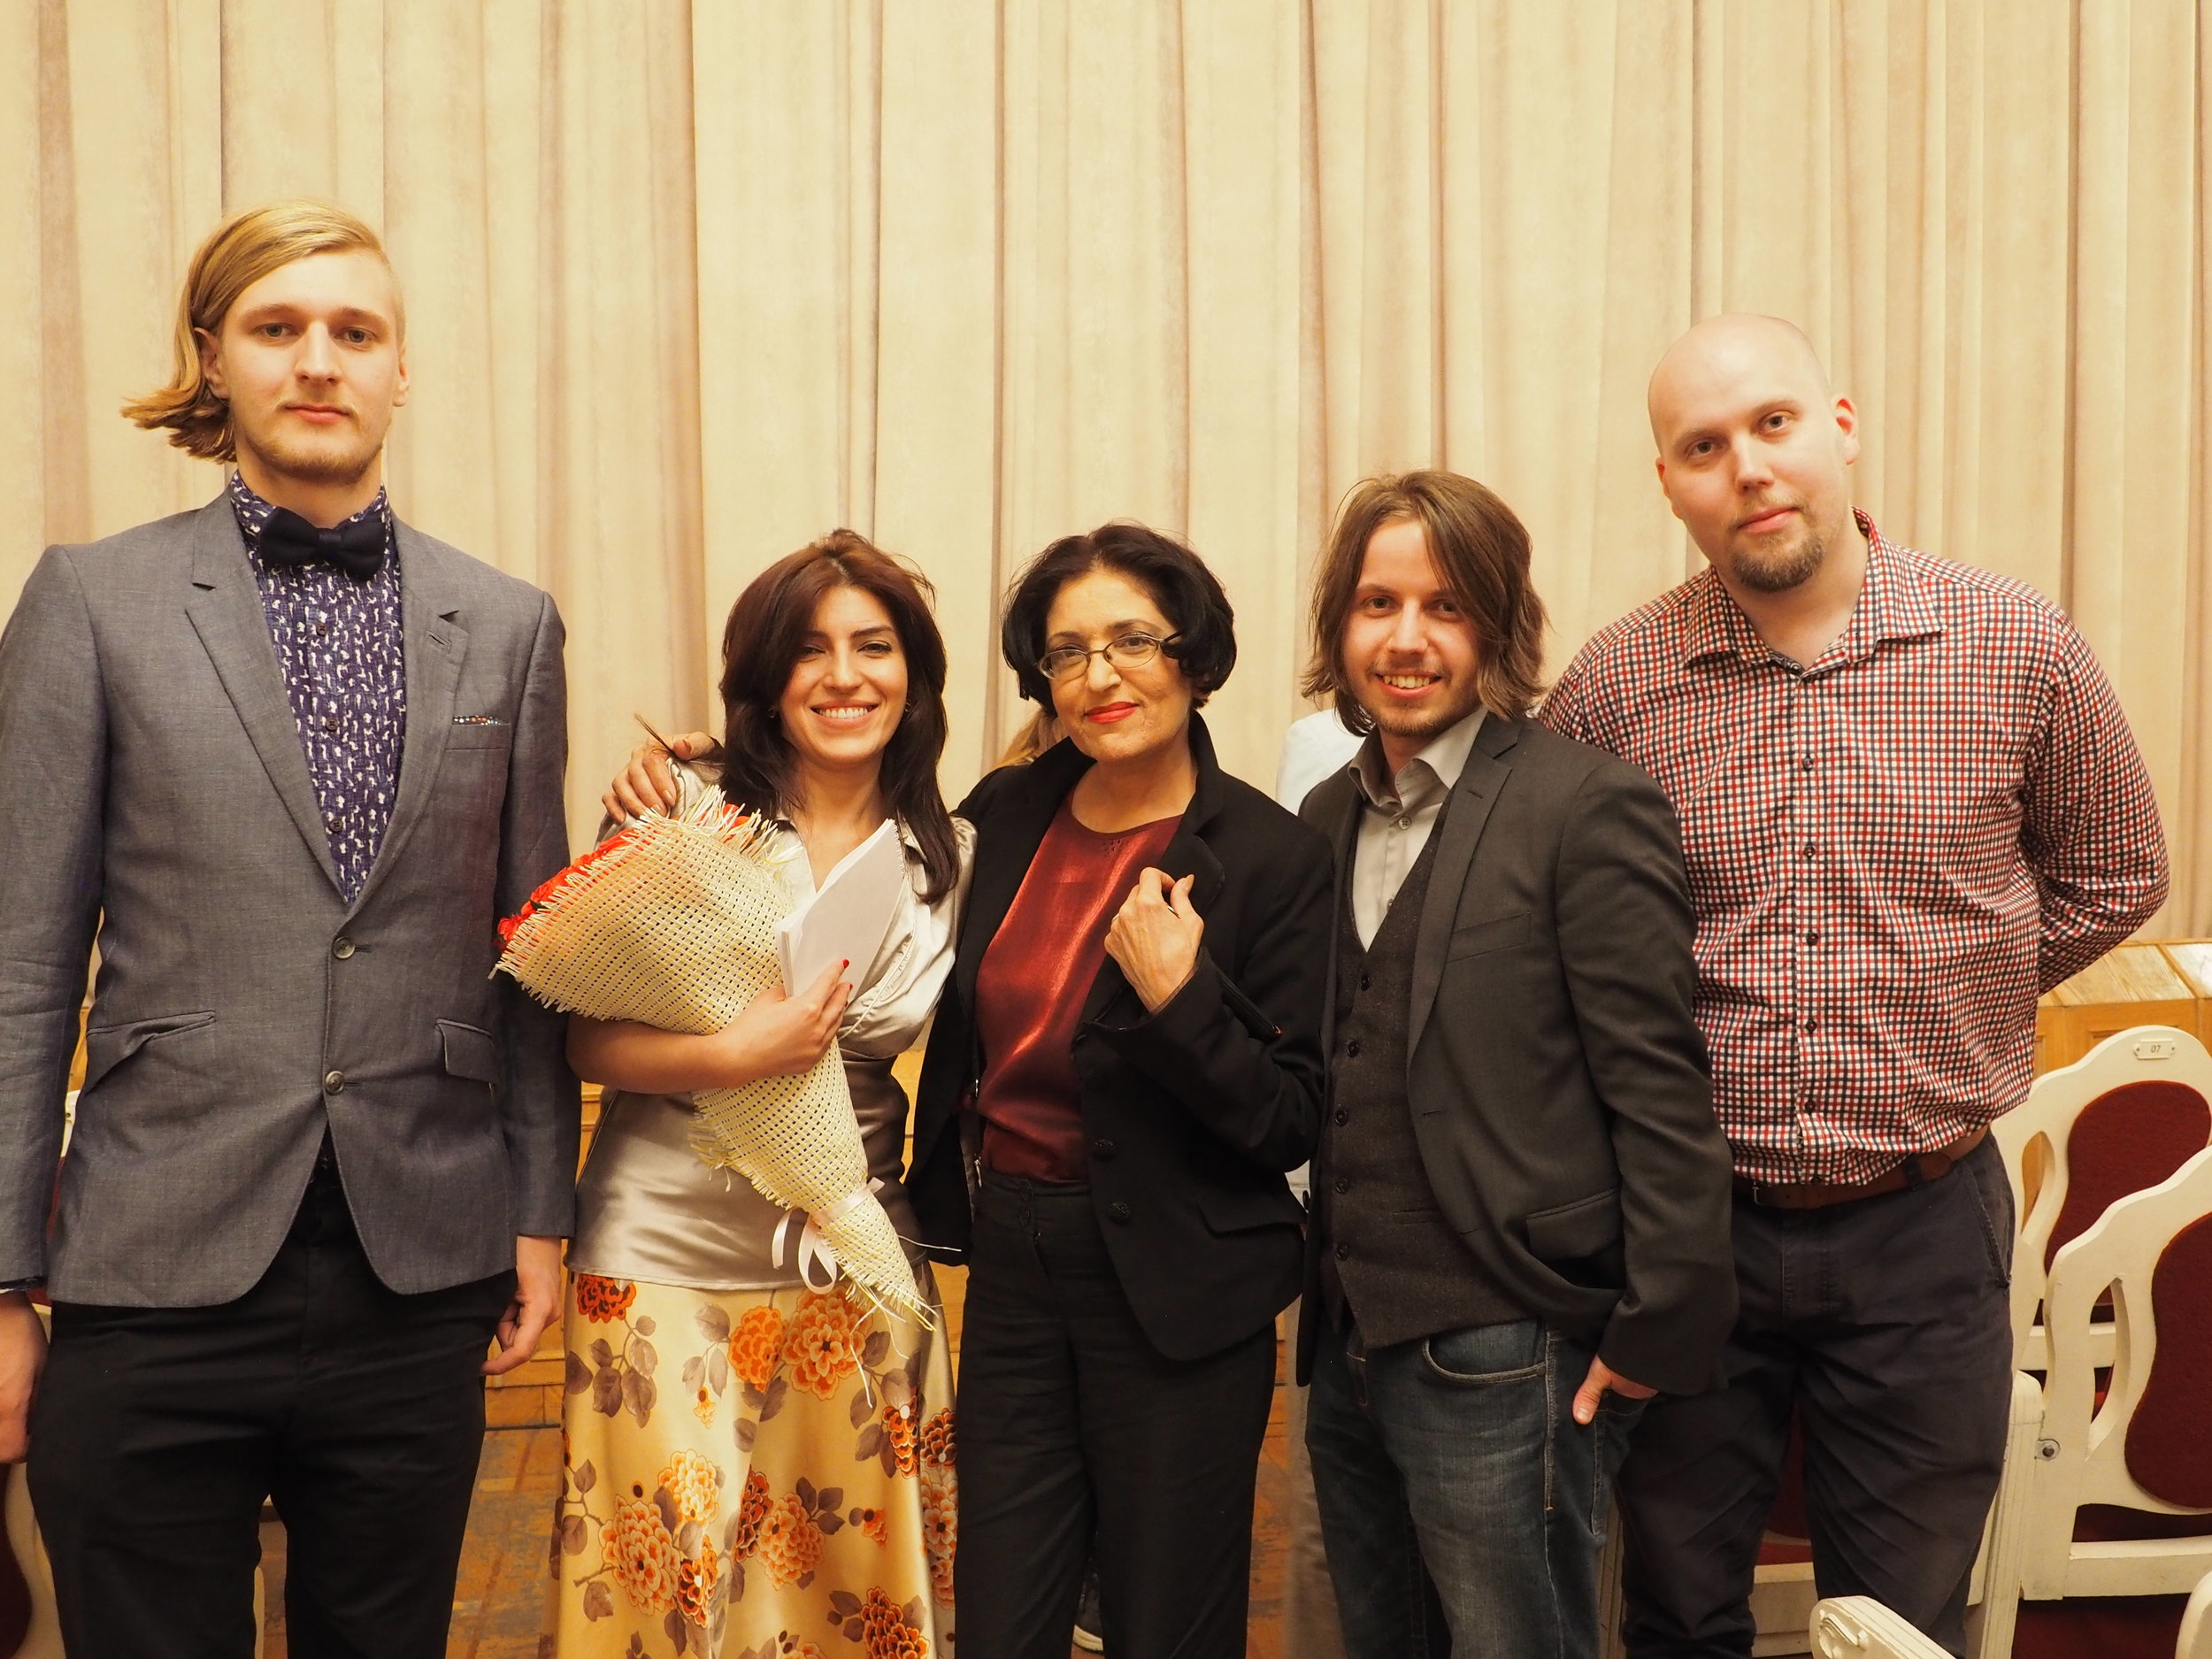 Christian Jilka at Sose International Film Festival 2016 in Yerevan;Armenia